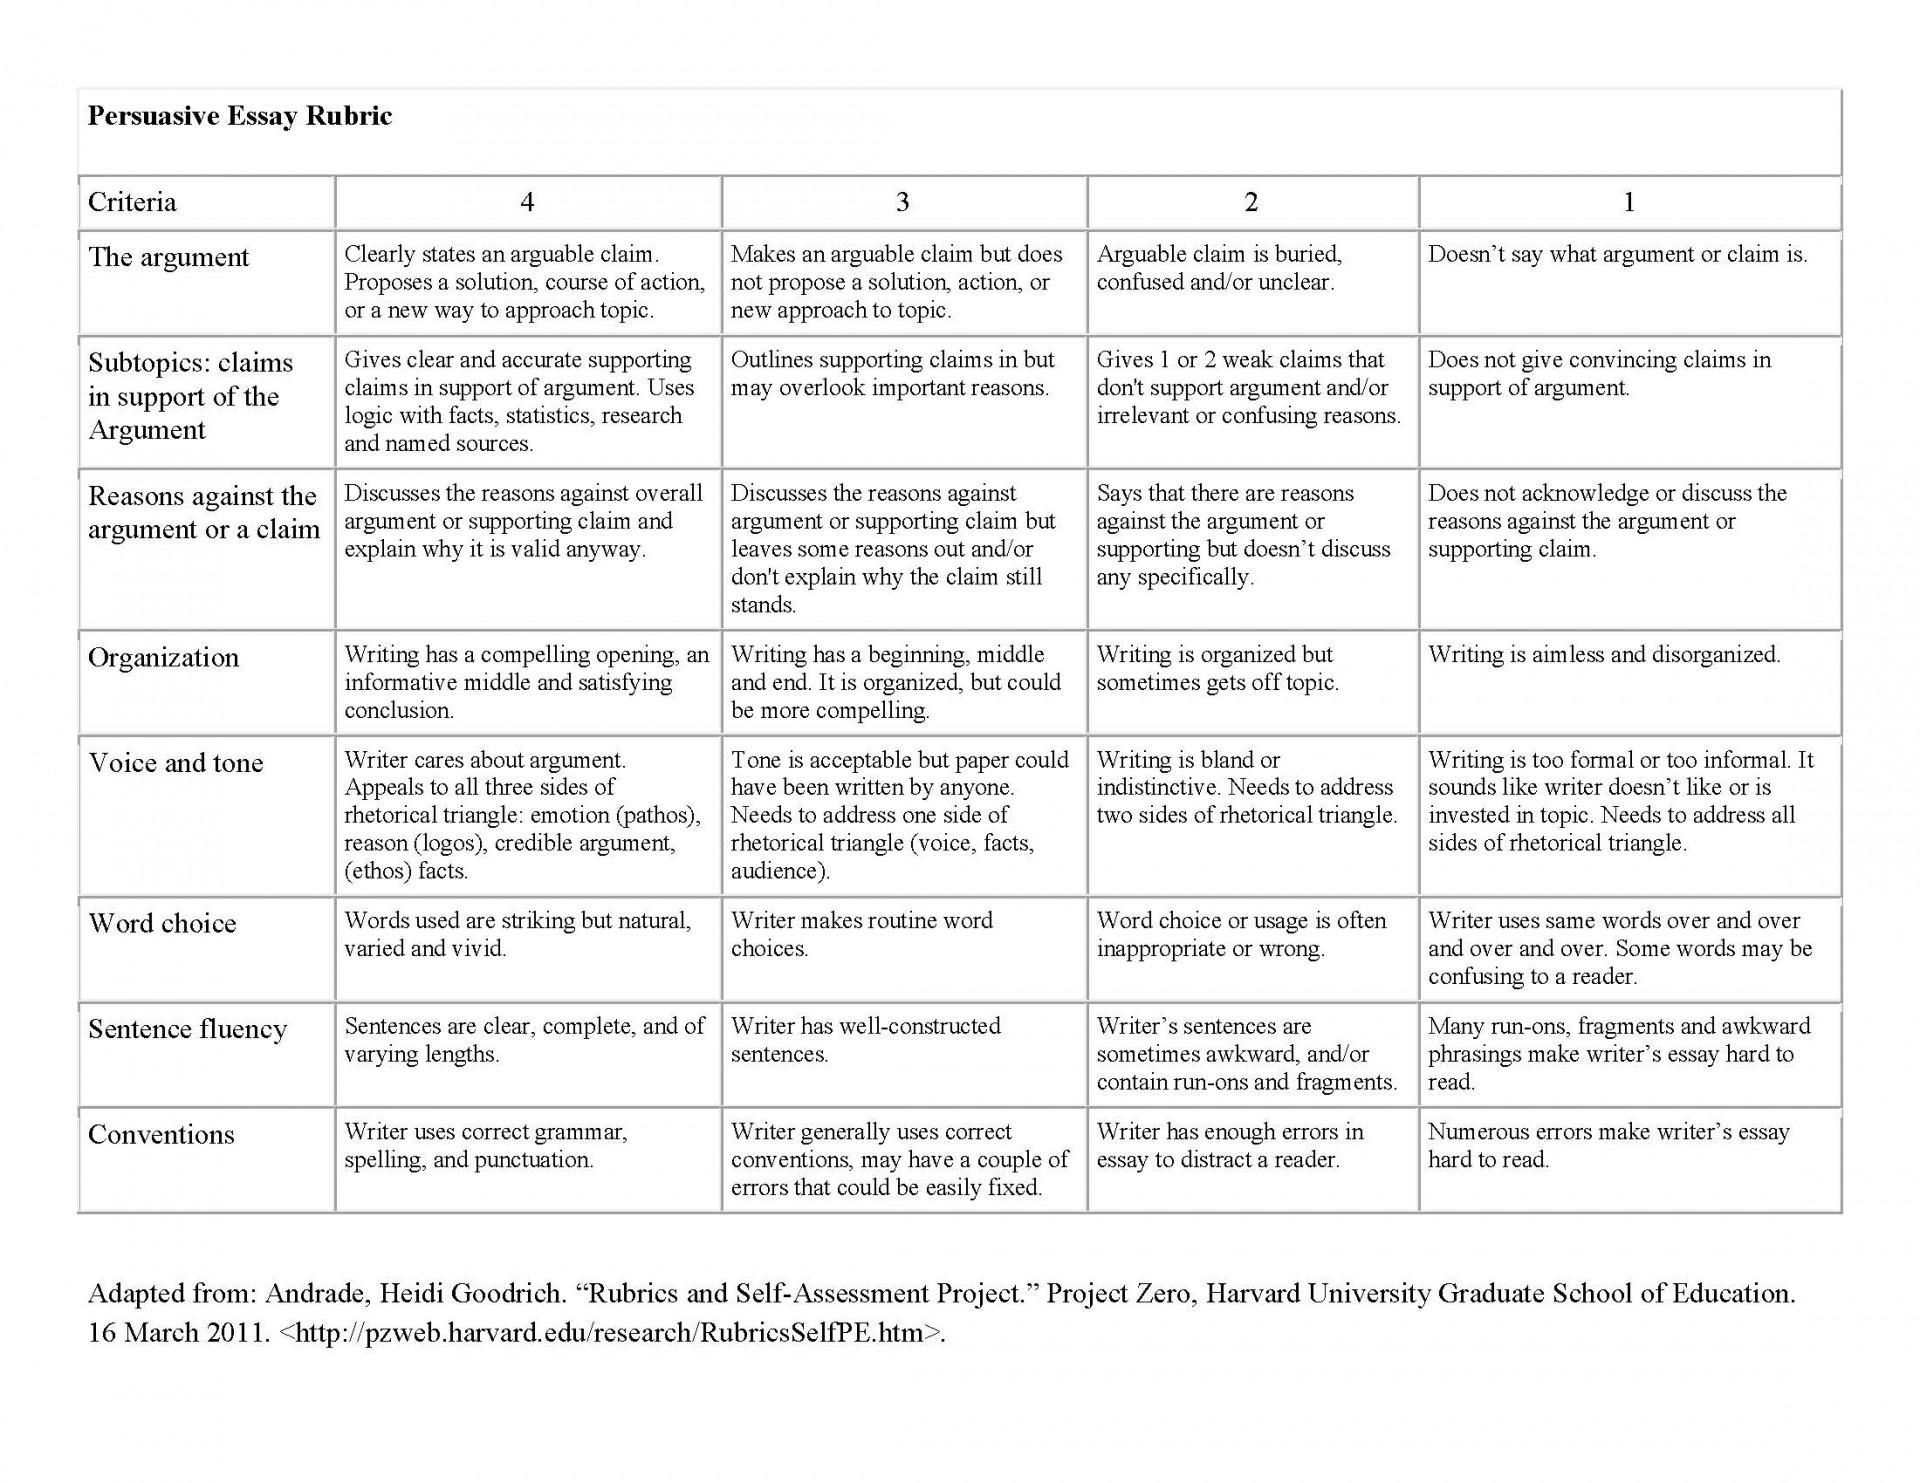 009 Essay Example Argumentative Examples For High School Handout Persuasive Striking Short Topics 1920